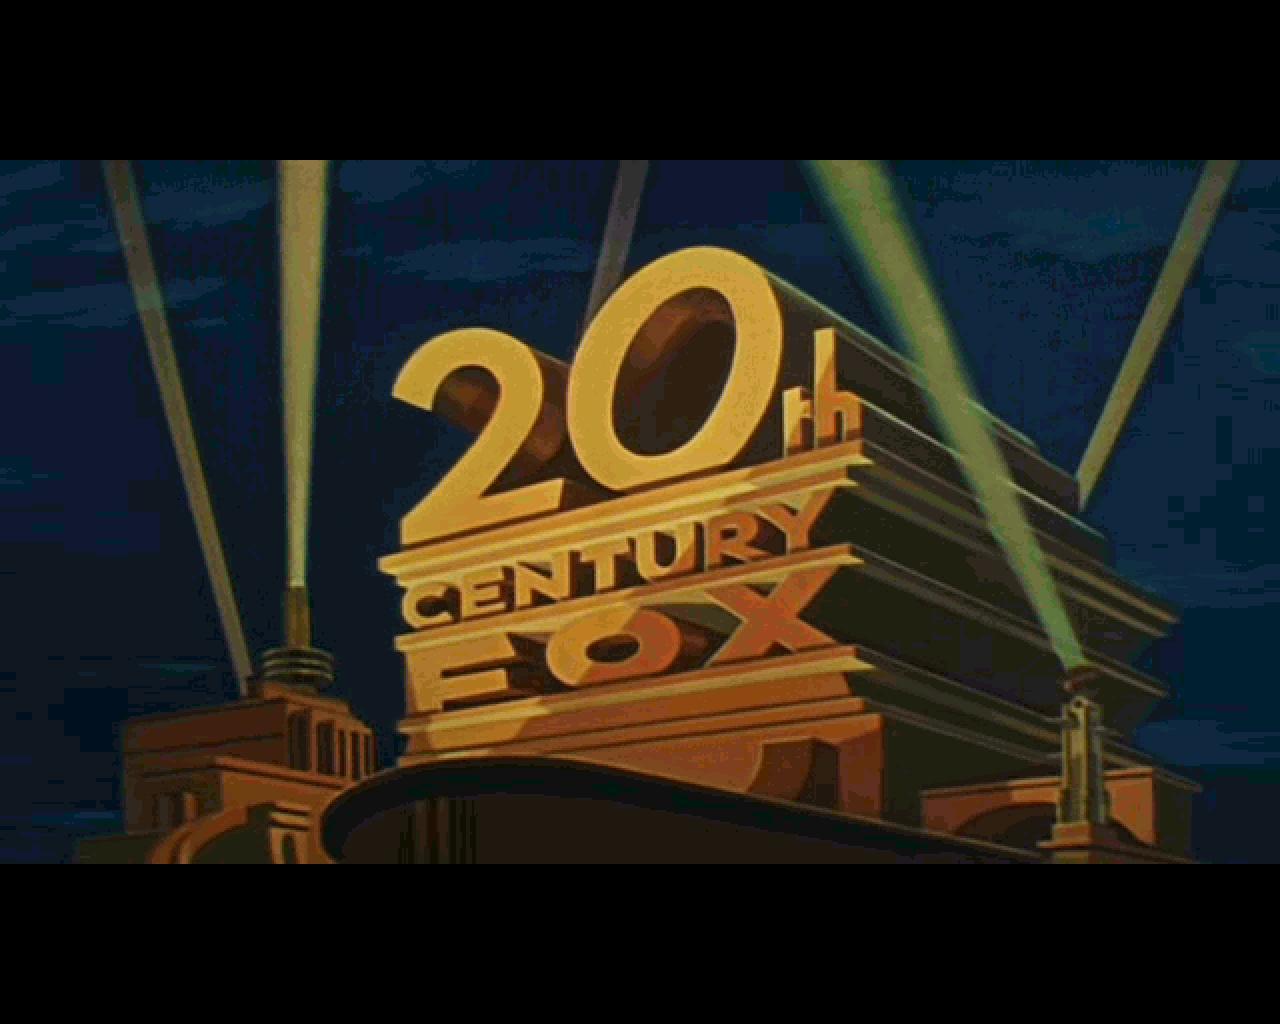 http://1.bp.blogspot.com/_zSf3XbzpUWc/TCOSWePC9dI/AAAAAAAAA44/RjvJaFVTGrY/s1600/20090823000250!Screenshot_20th_Century_Fox_Logo_in_1975.jpg